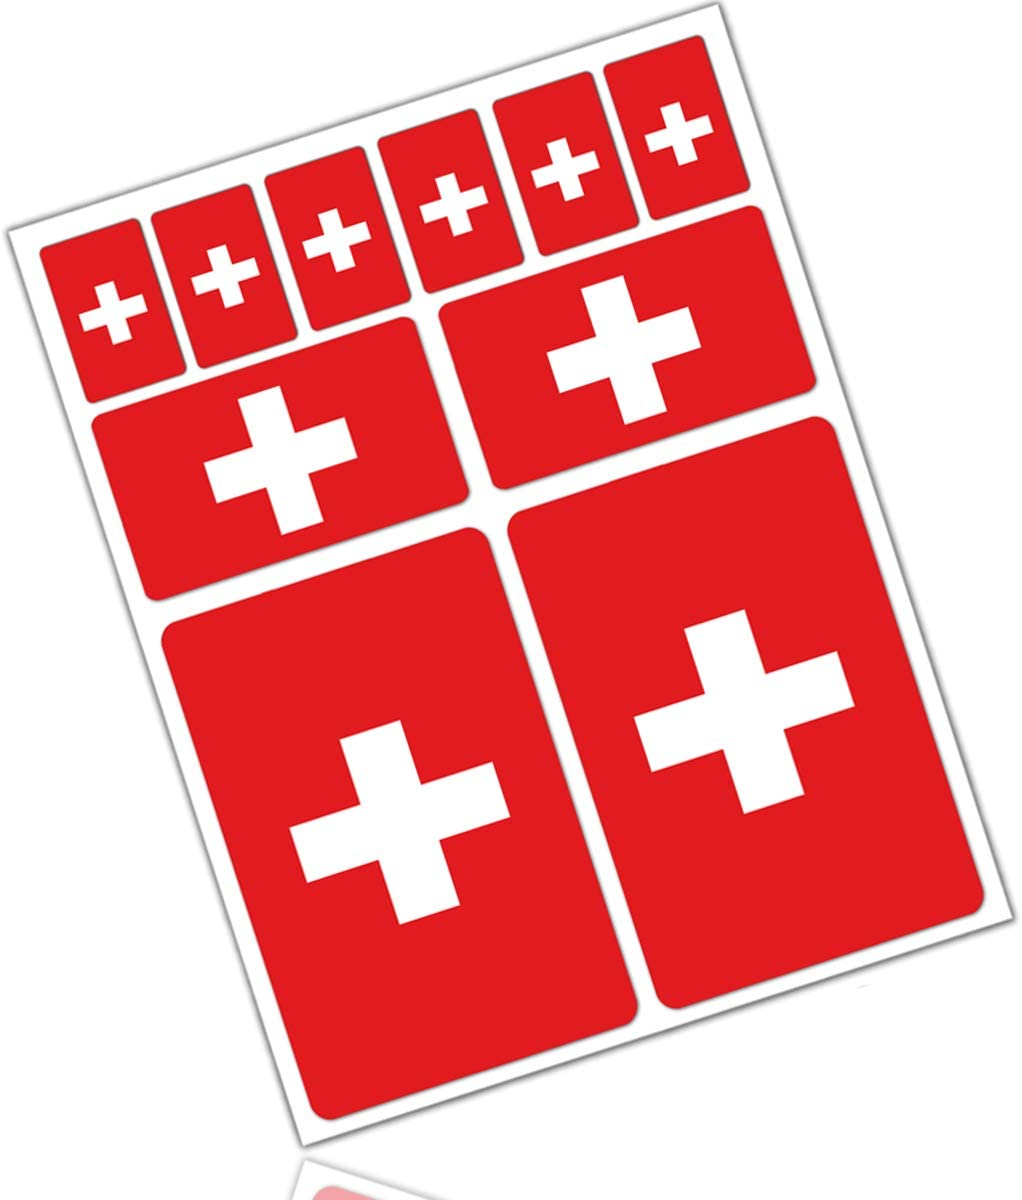 Biomar Labs 10 X Vinyl Aufkleber Autoaufkleber Stickers Fahne Flagge Switzerland Schweiz Swiss Auto Moto Motorrad Fahrrad Scooter Fenster D 23 Auto